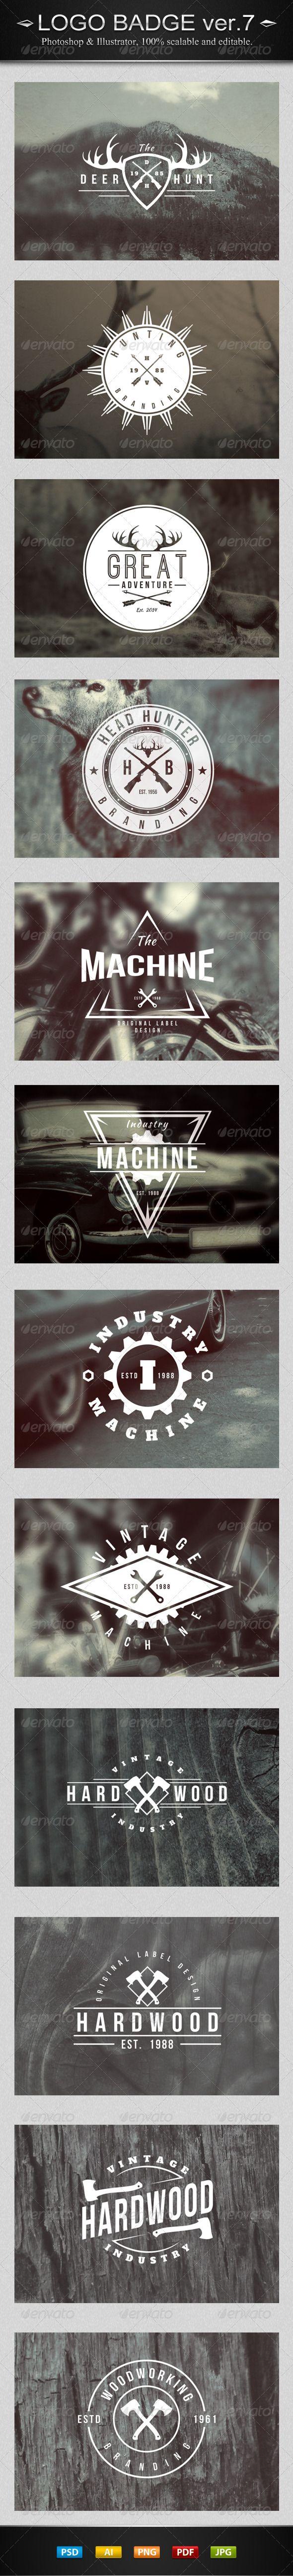 12 Vintage Logo Badges Template | Buy and Download: http://graphicriver.net/item/12-vintage-logo-badges-ver7/7880588?WT.ac=category_thumb&WT.z_author=SuperPencil&ref=ksioks